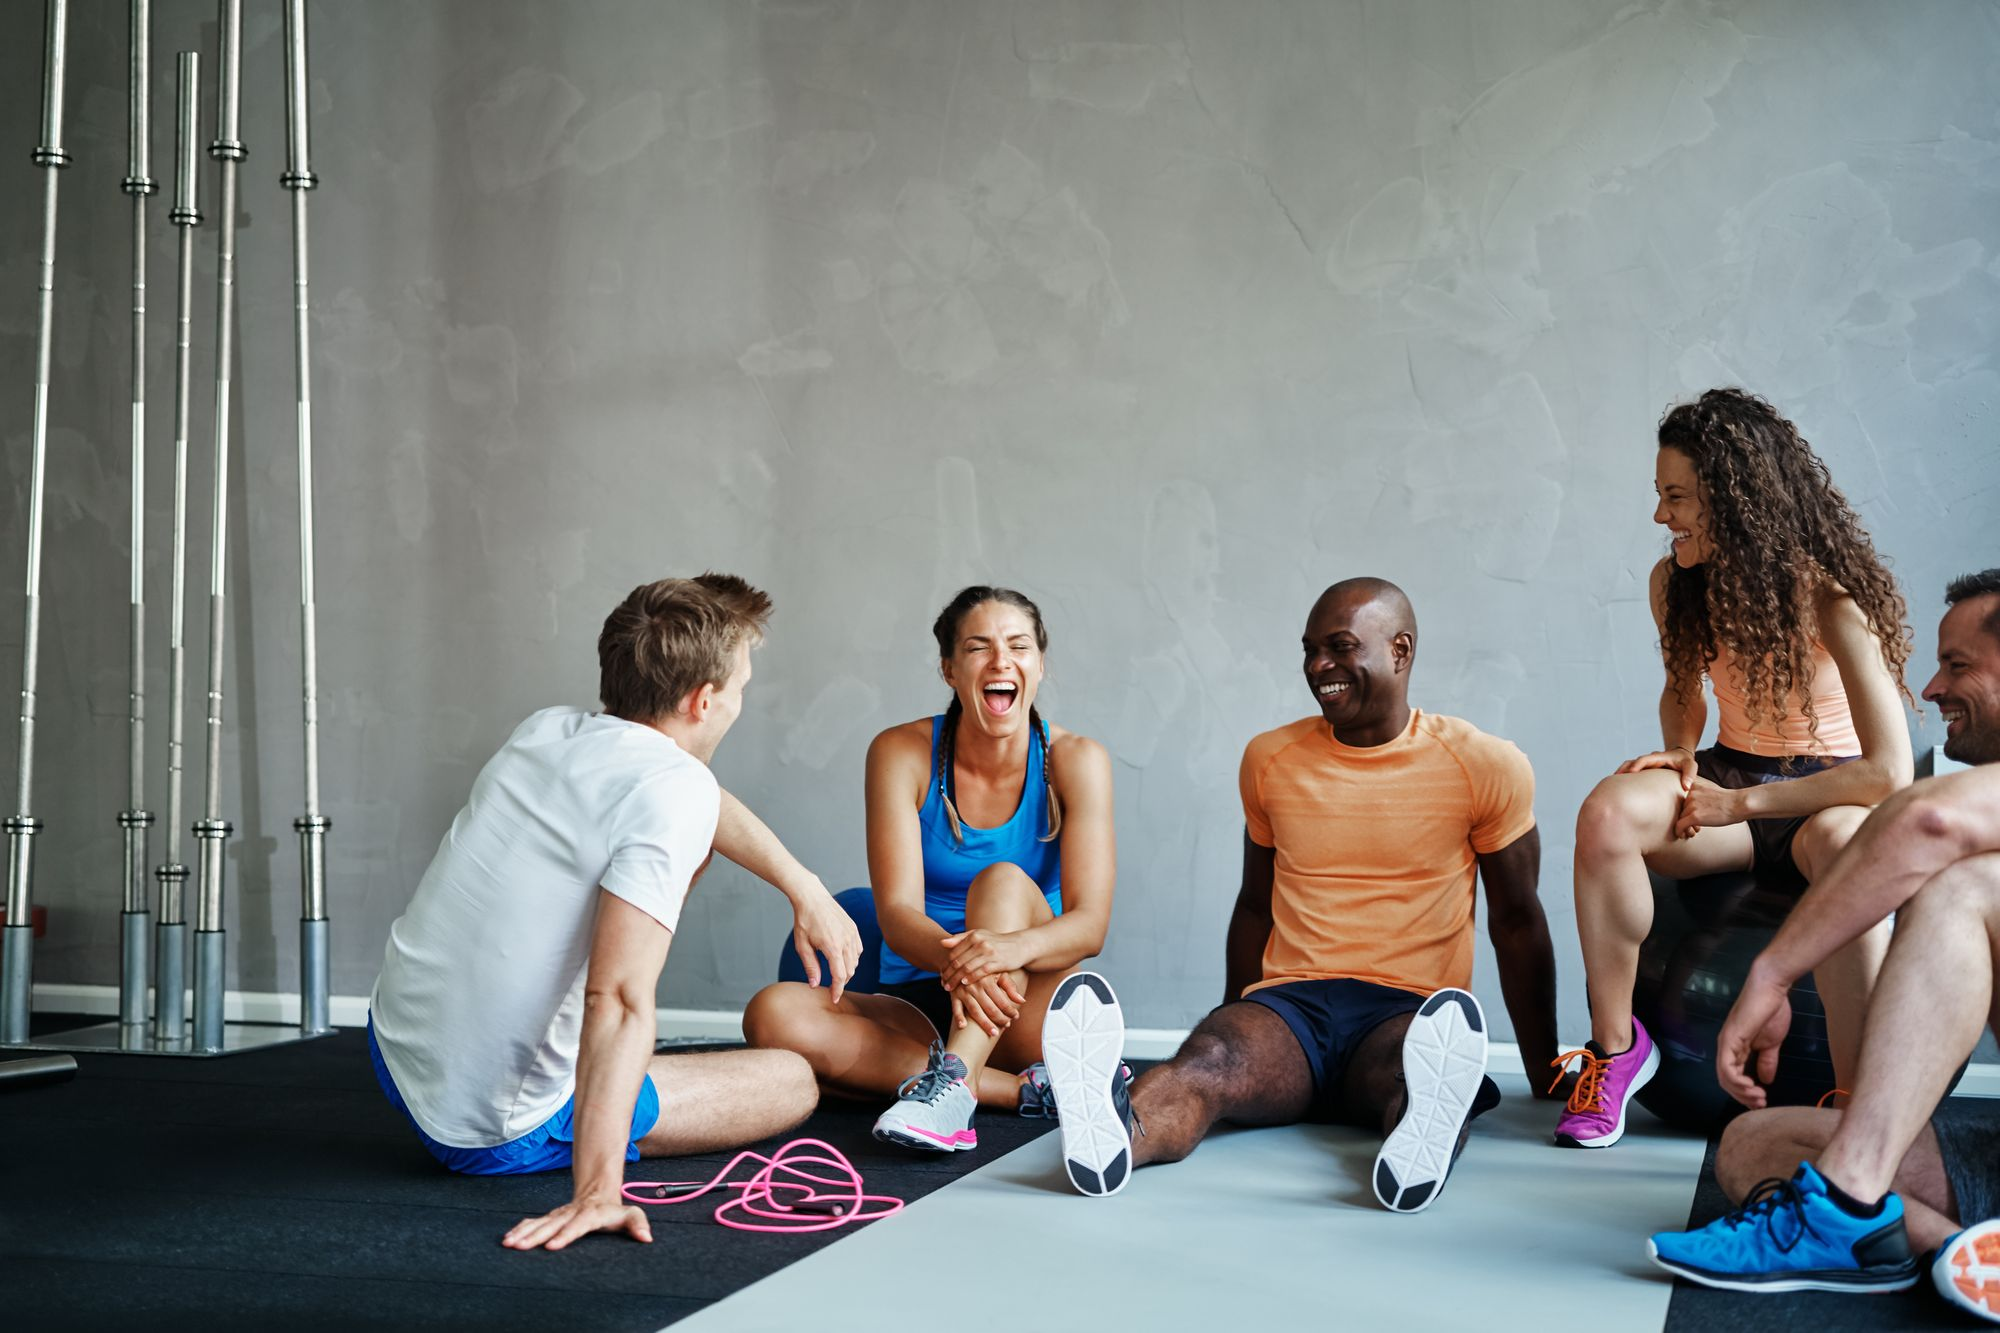 friends-exercising